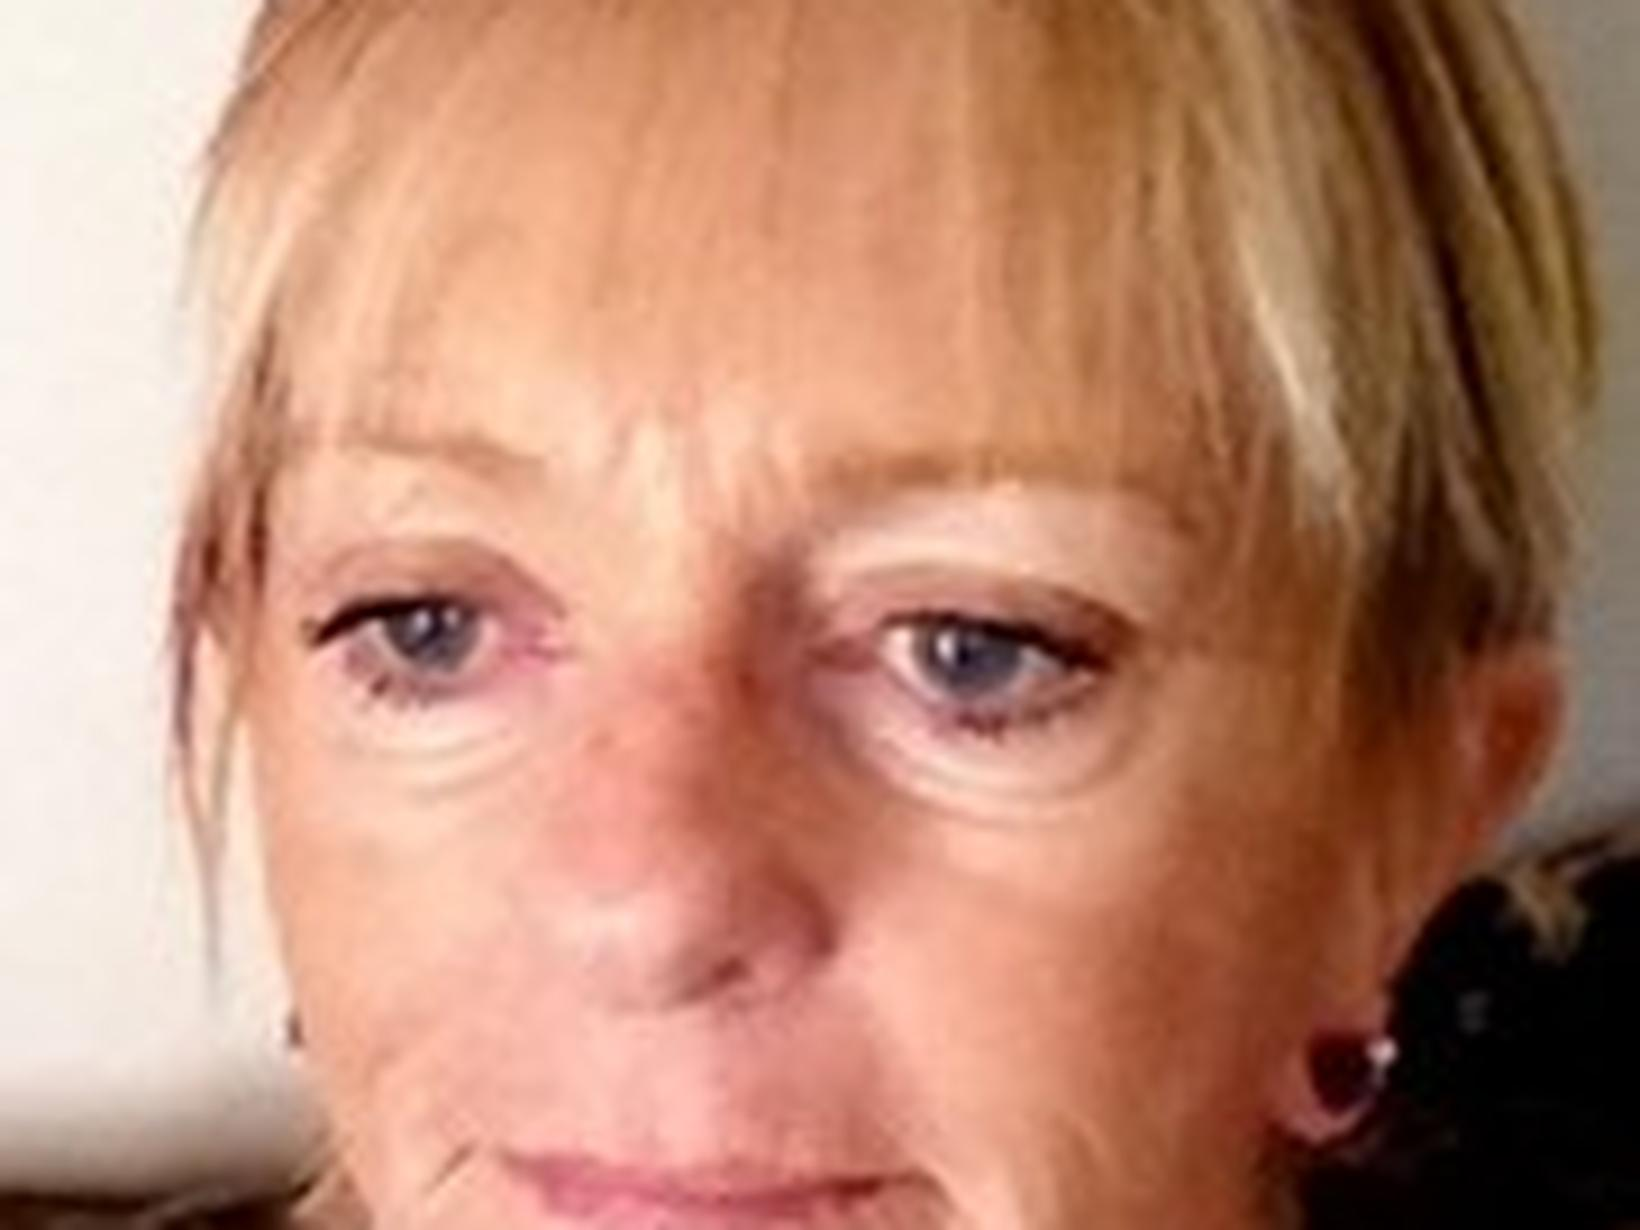 Lorraine from Perth, Western Australia, Australia